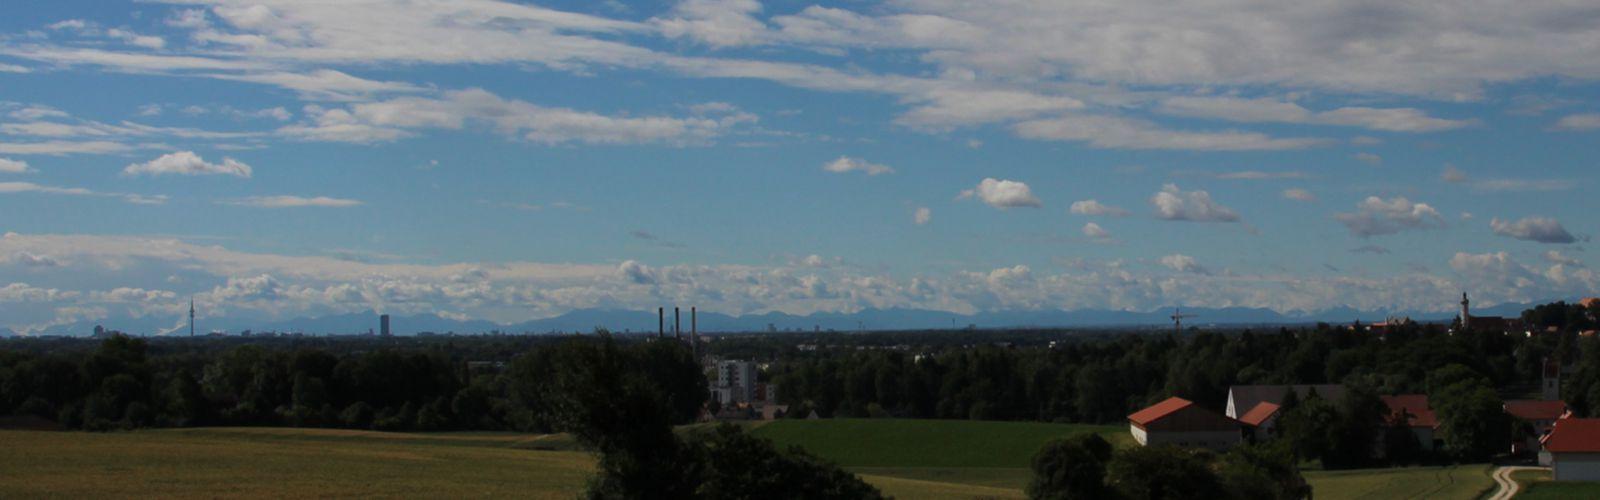 Dachau, Panorama mit Bergen, Olympiaturm München